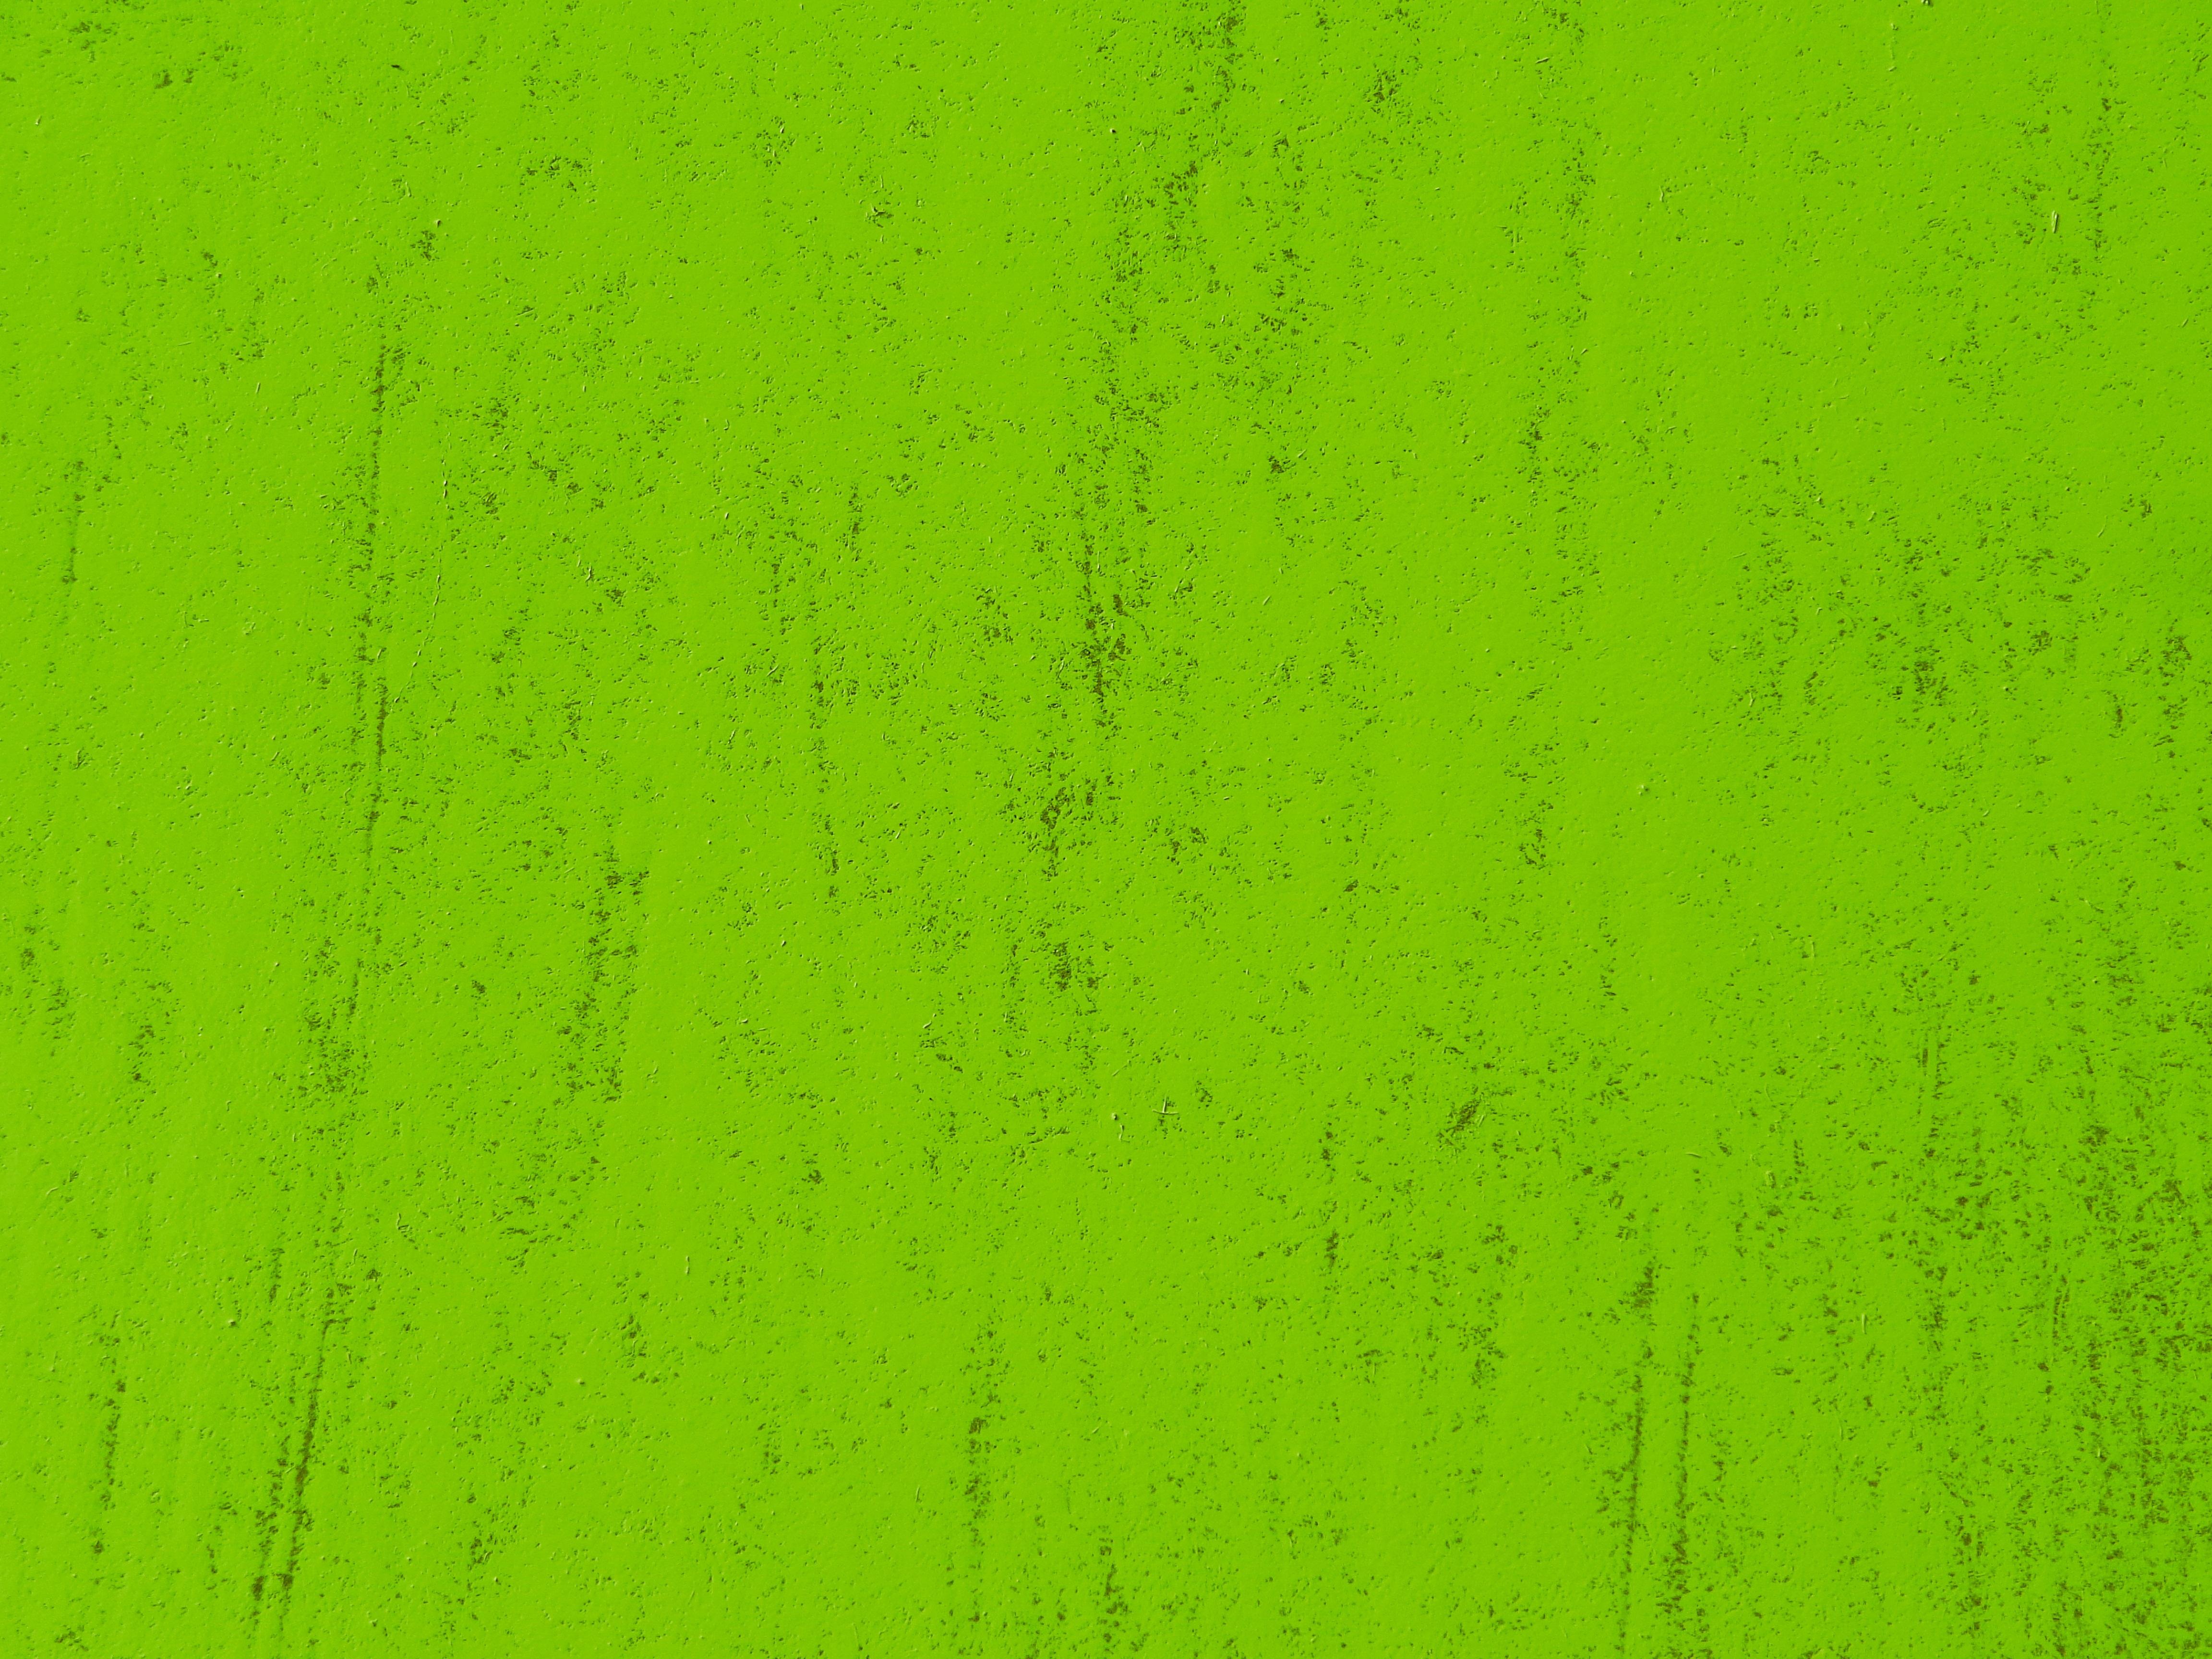 Unduh 52+ Background Warna Hijau Dan Kuning Paling Keren